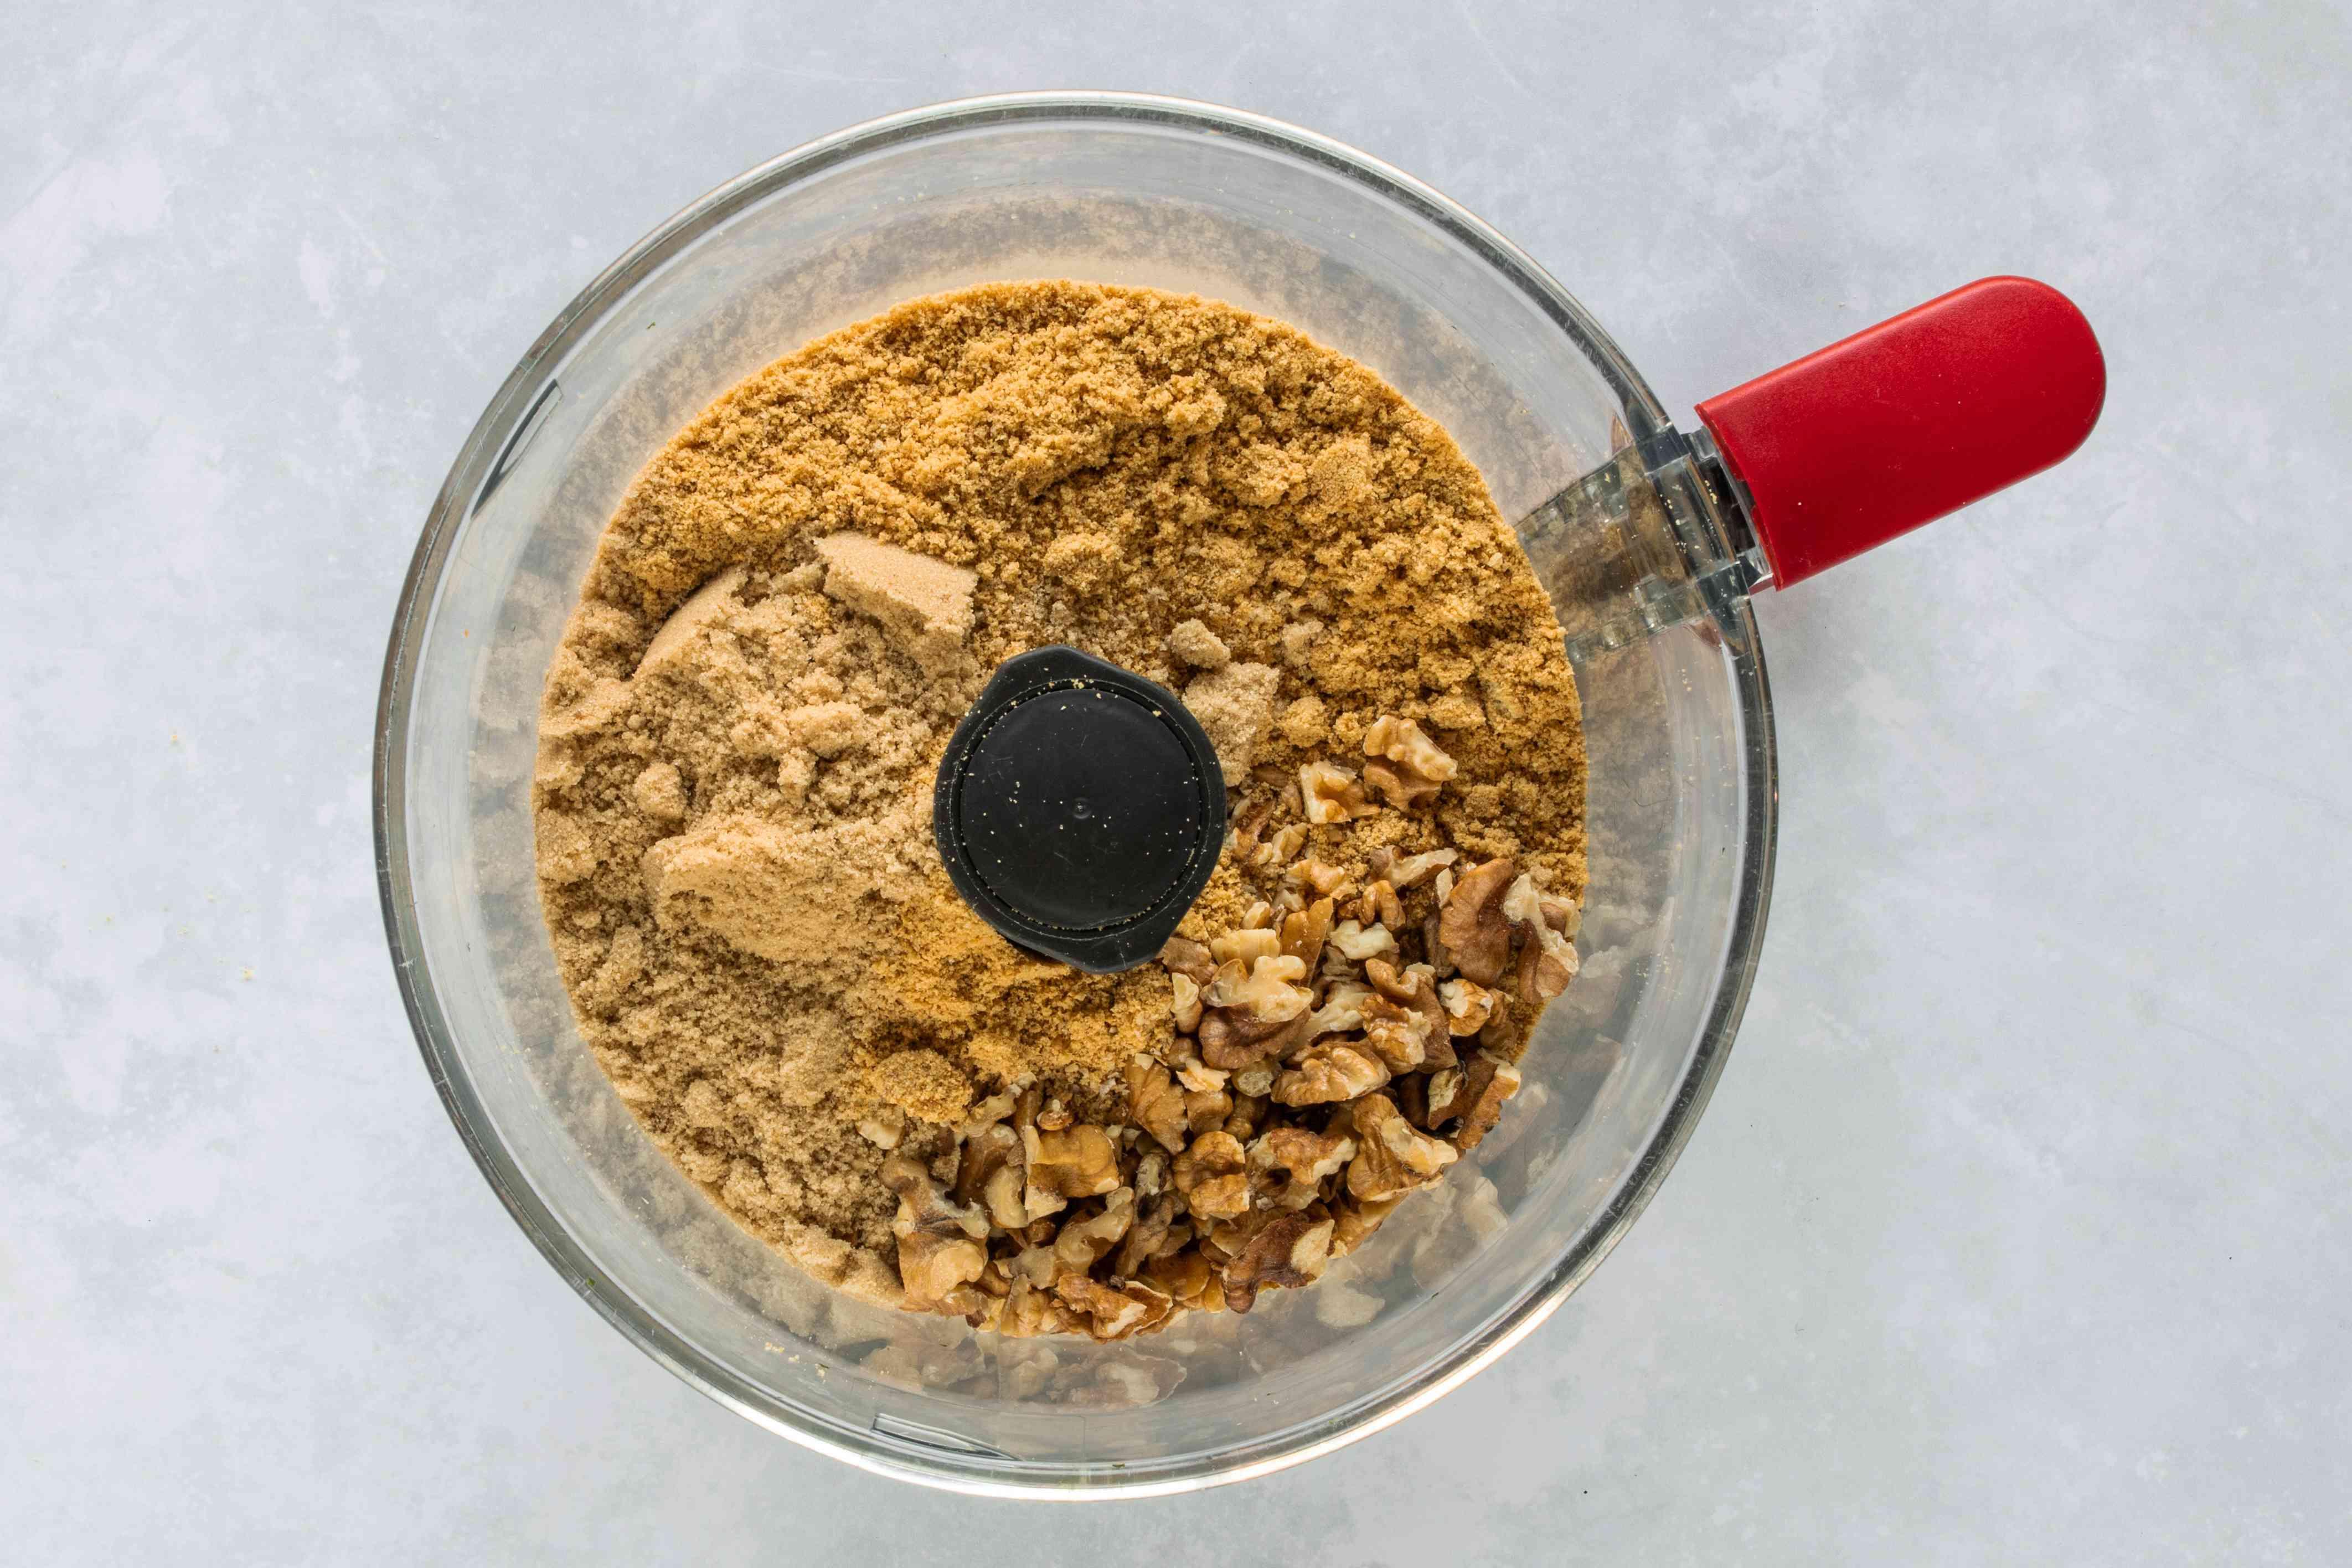 Ground crumbs, walnuts, brown sugar